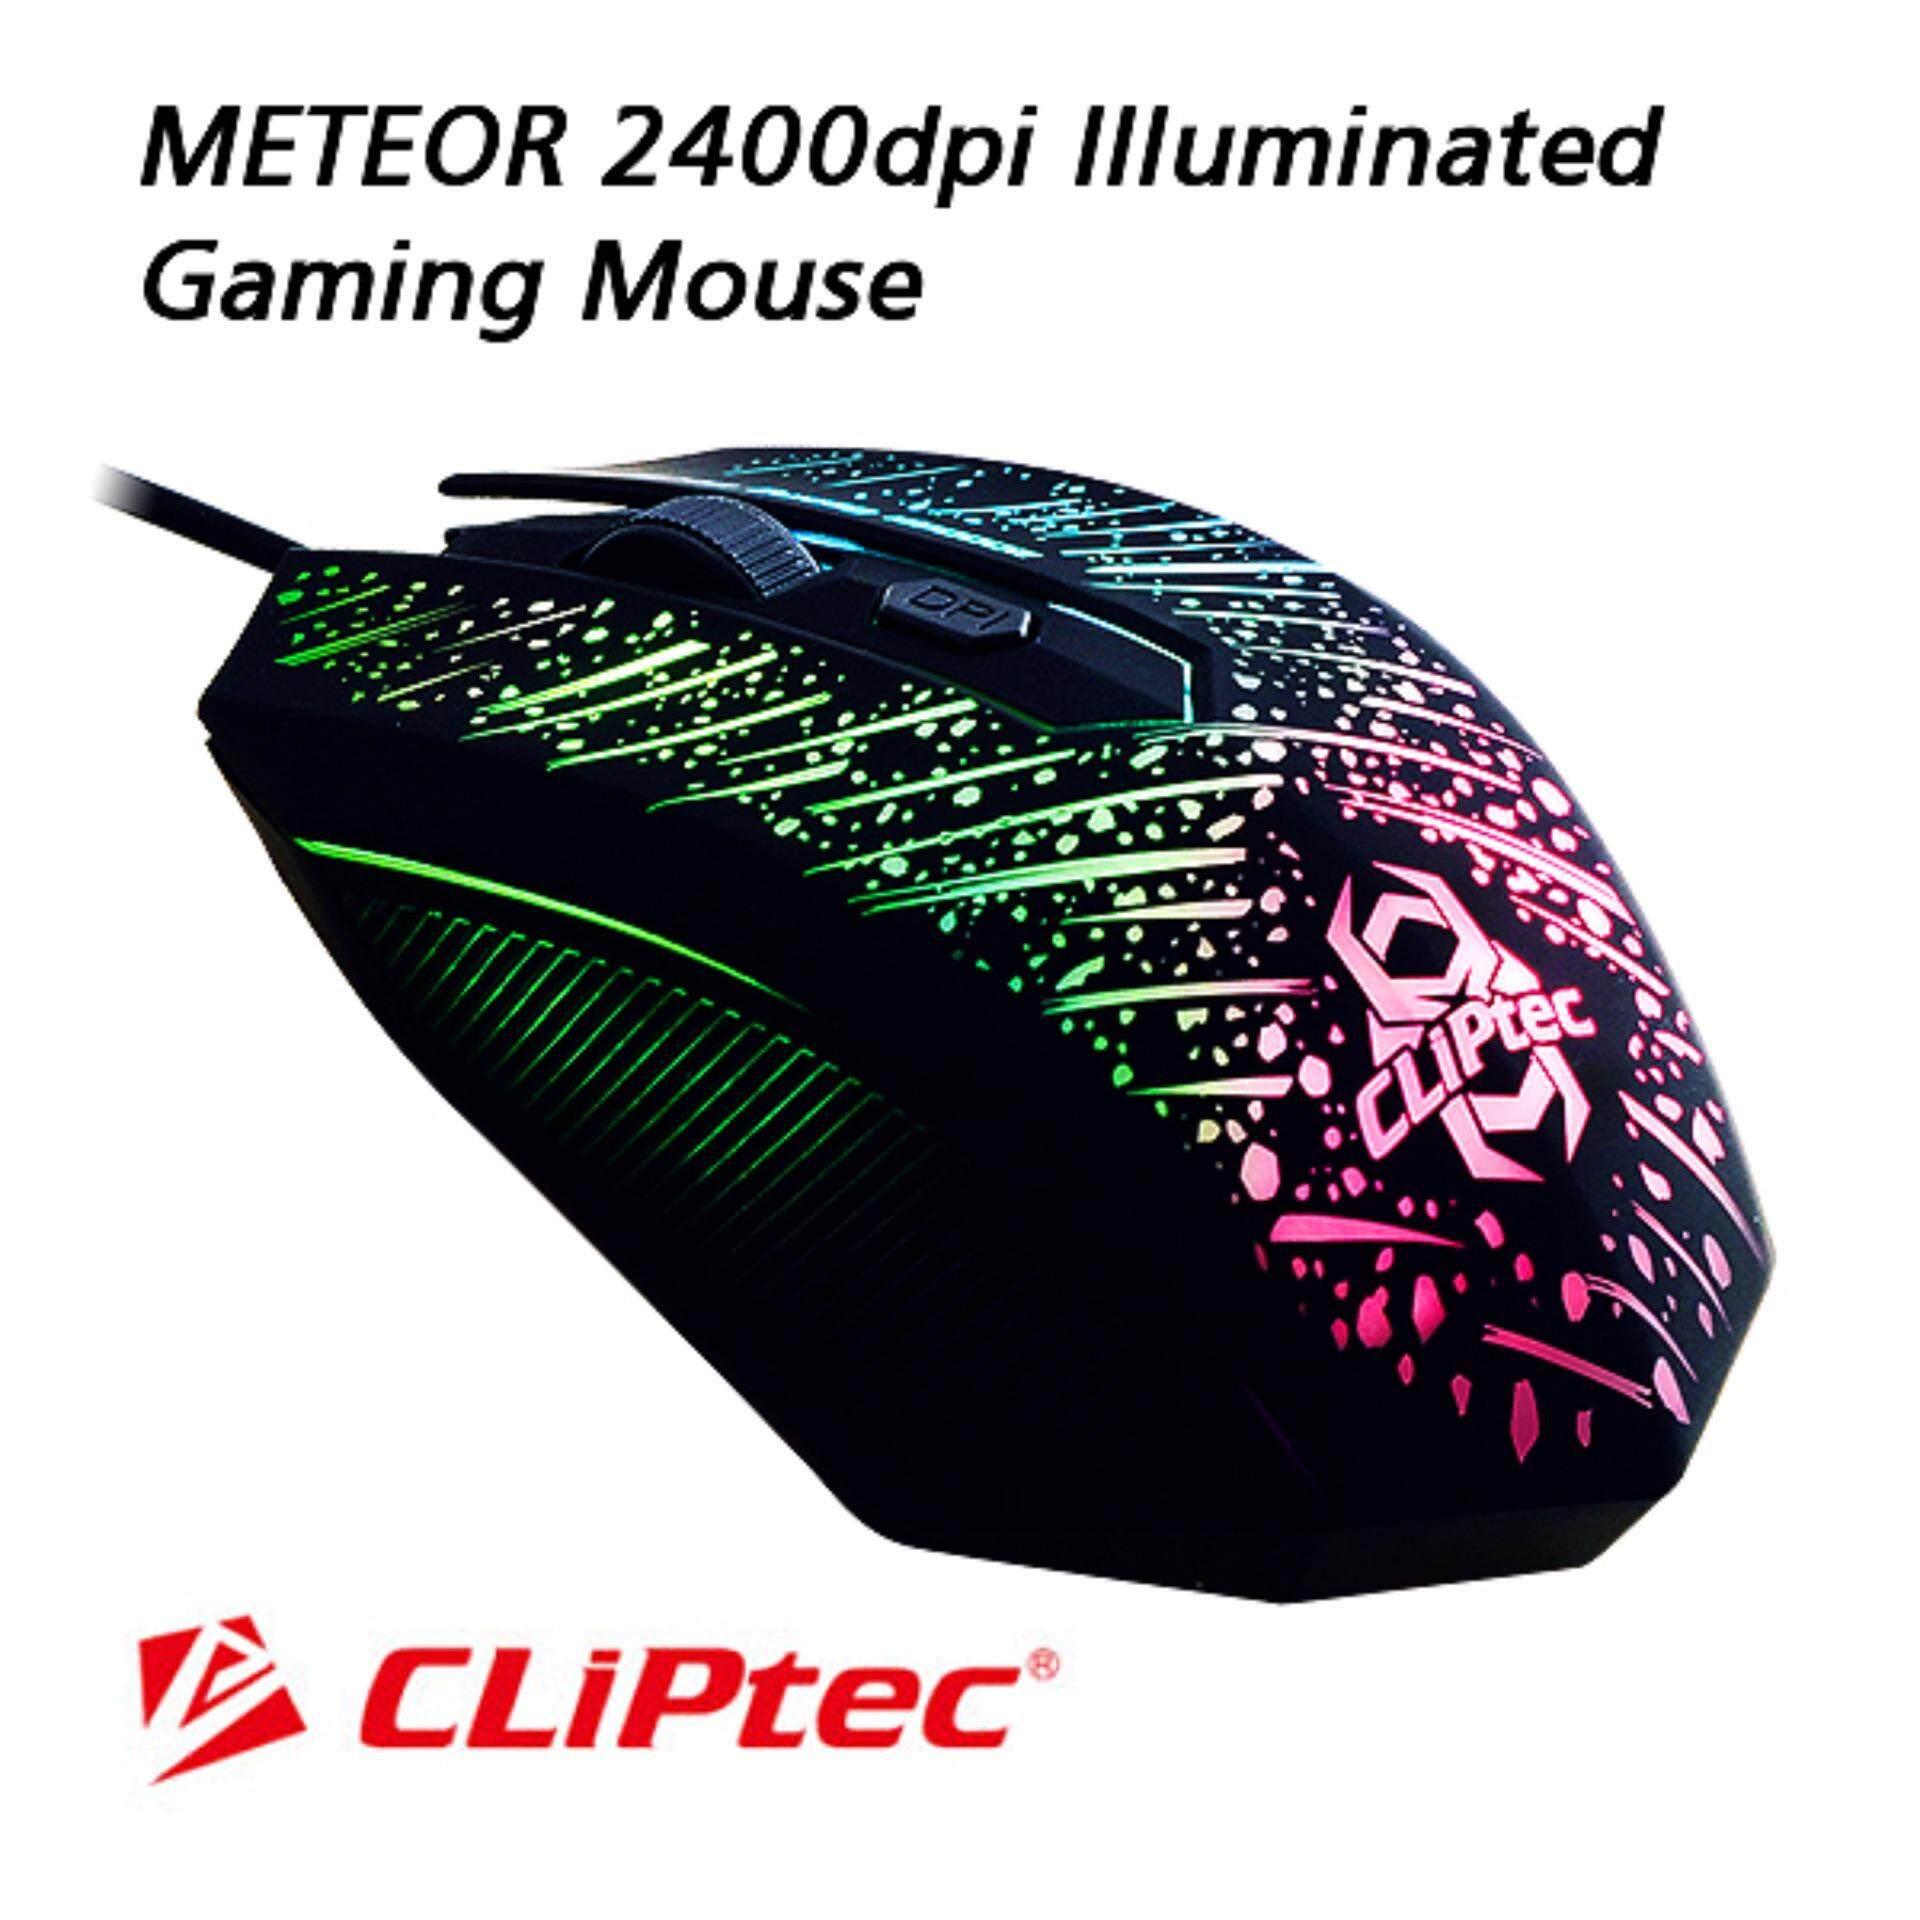 Cliptec 2400dpi Illuminated Gaming Mouse Rgs502 Malaysia Hp M100